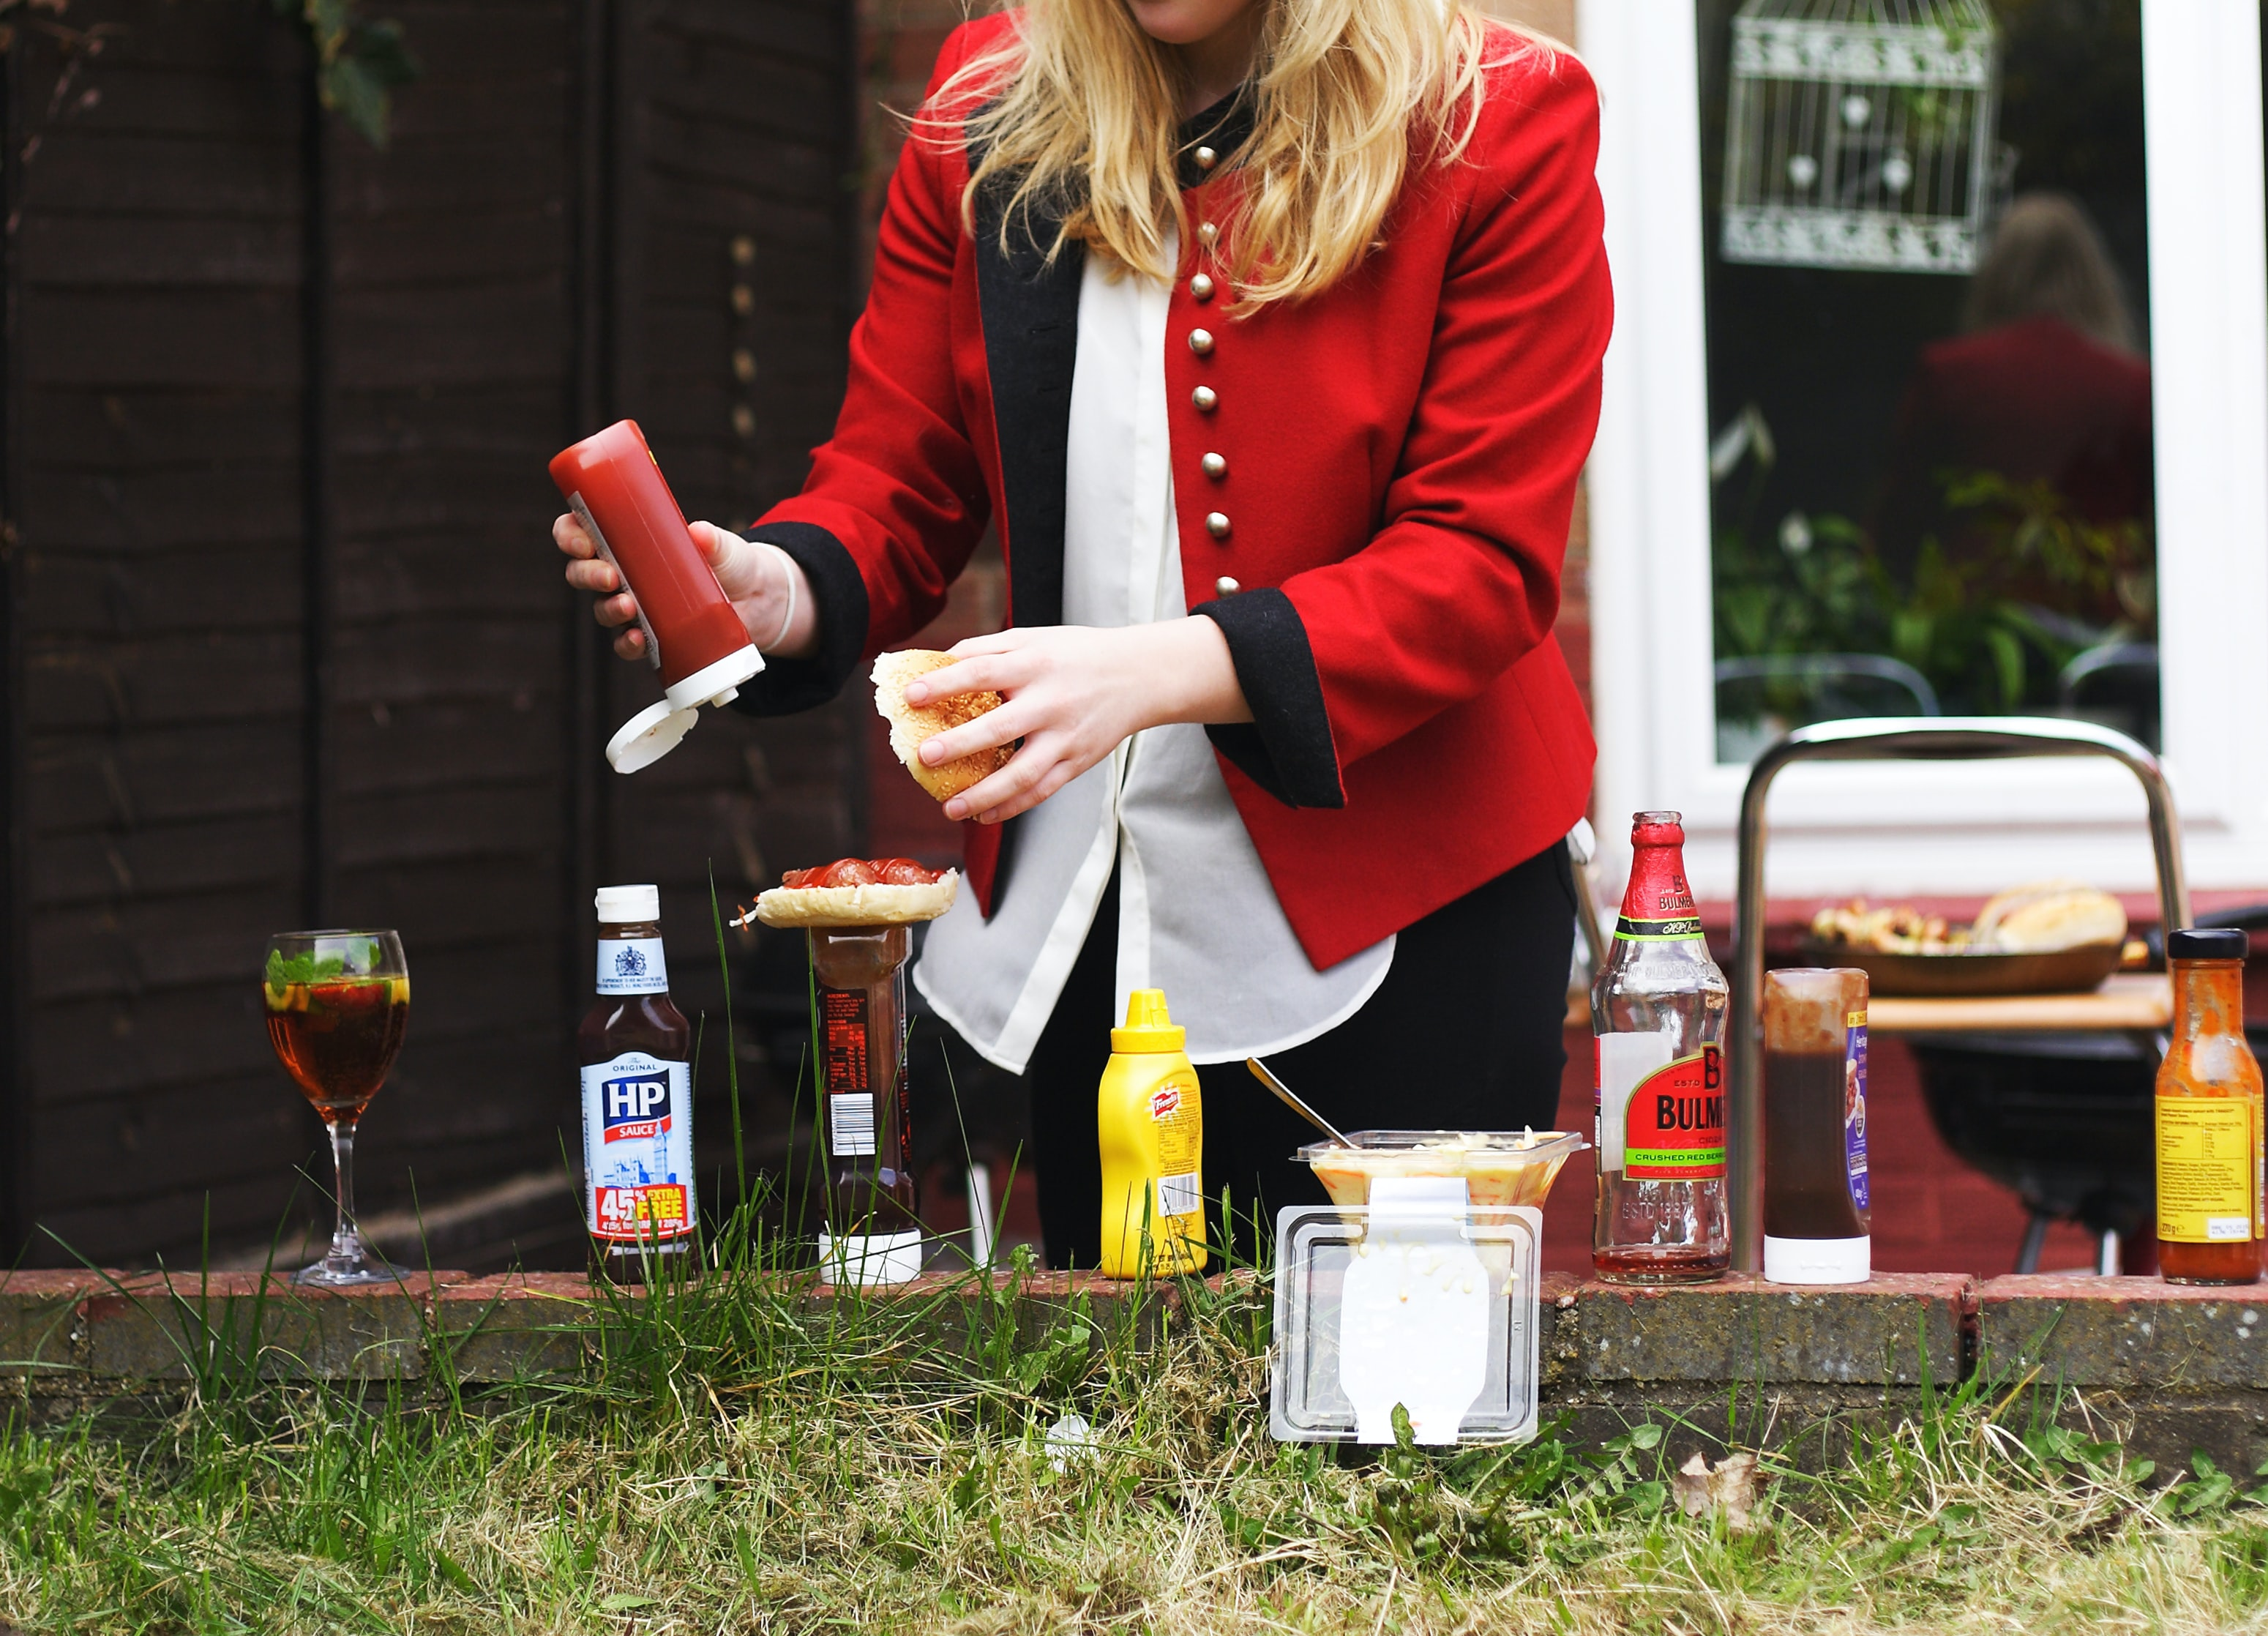 woman putting red sauce on hamburger